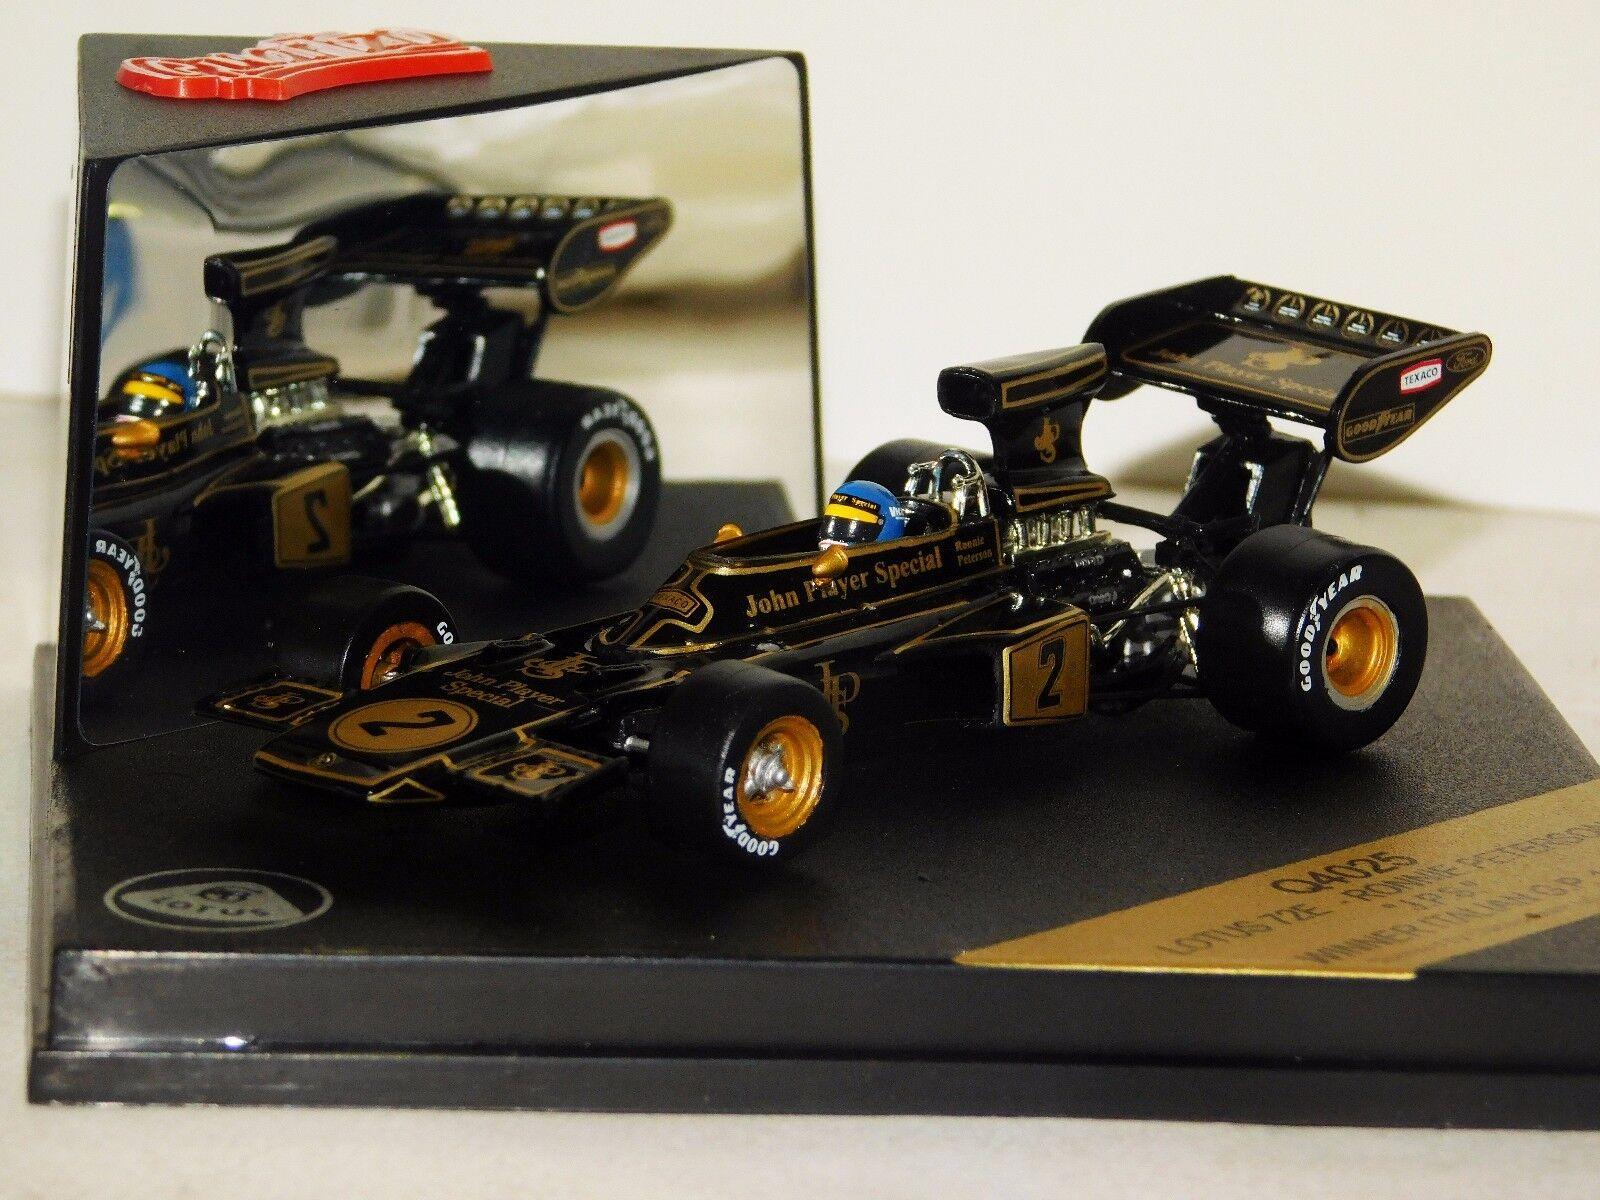 72E Lotus JPS  2 Ronnie Peterson ganador italiano Grand Prix 1973 Quartzo Q4025 1 43